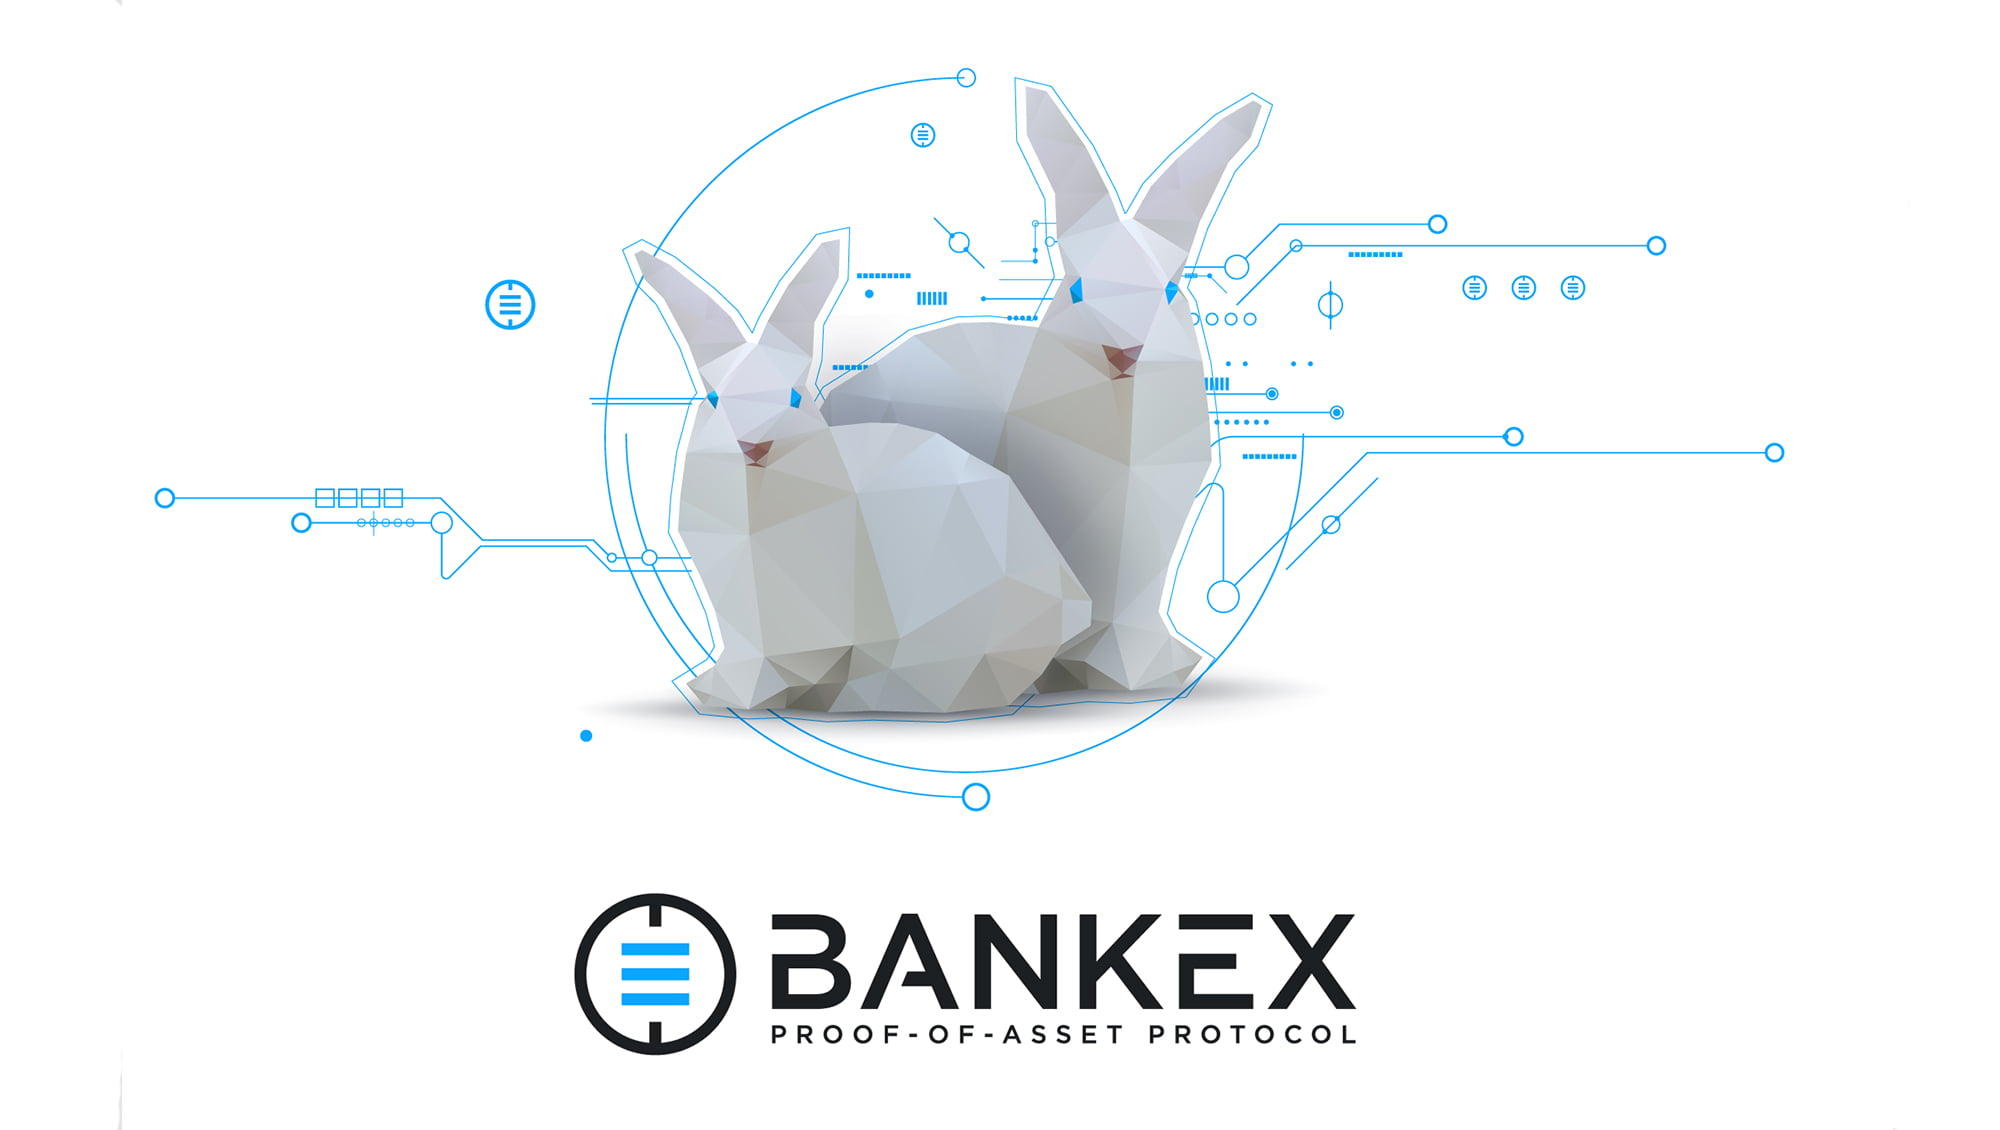 bankex rabbits themerkle